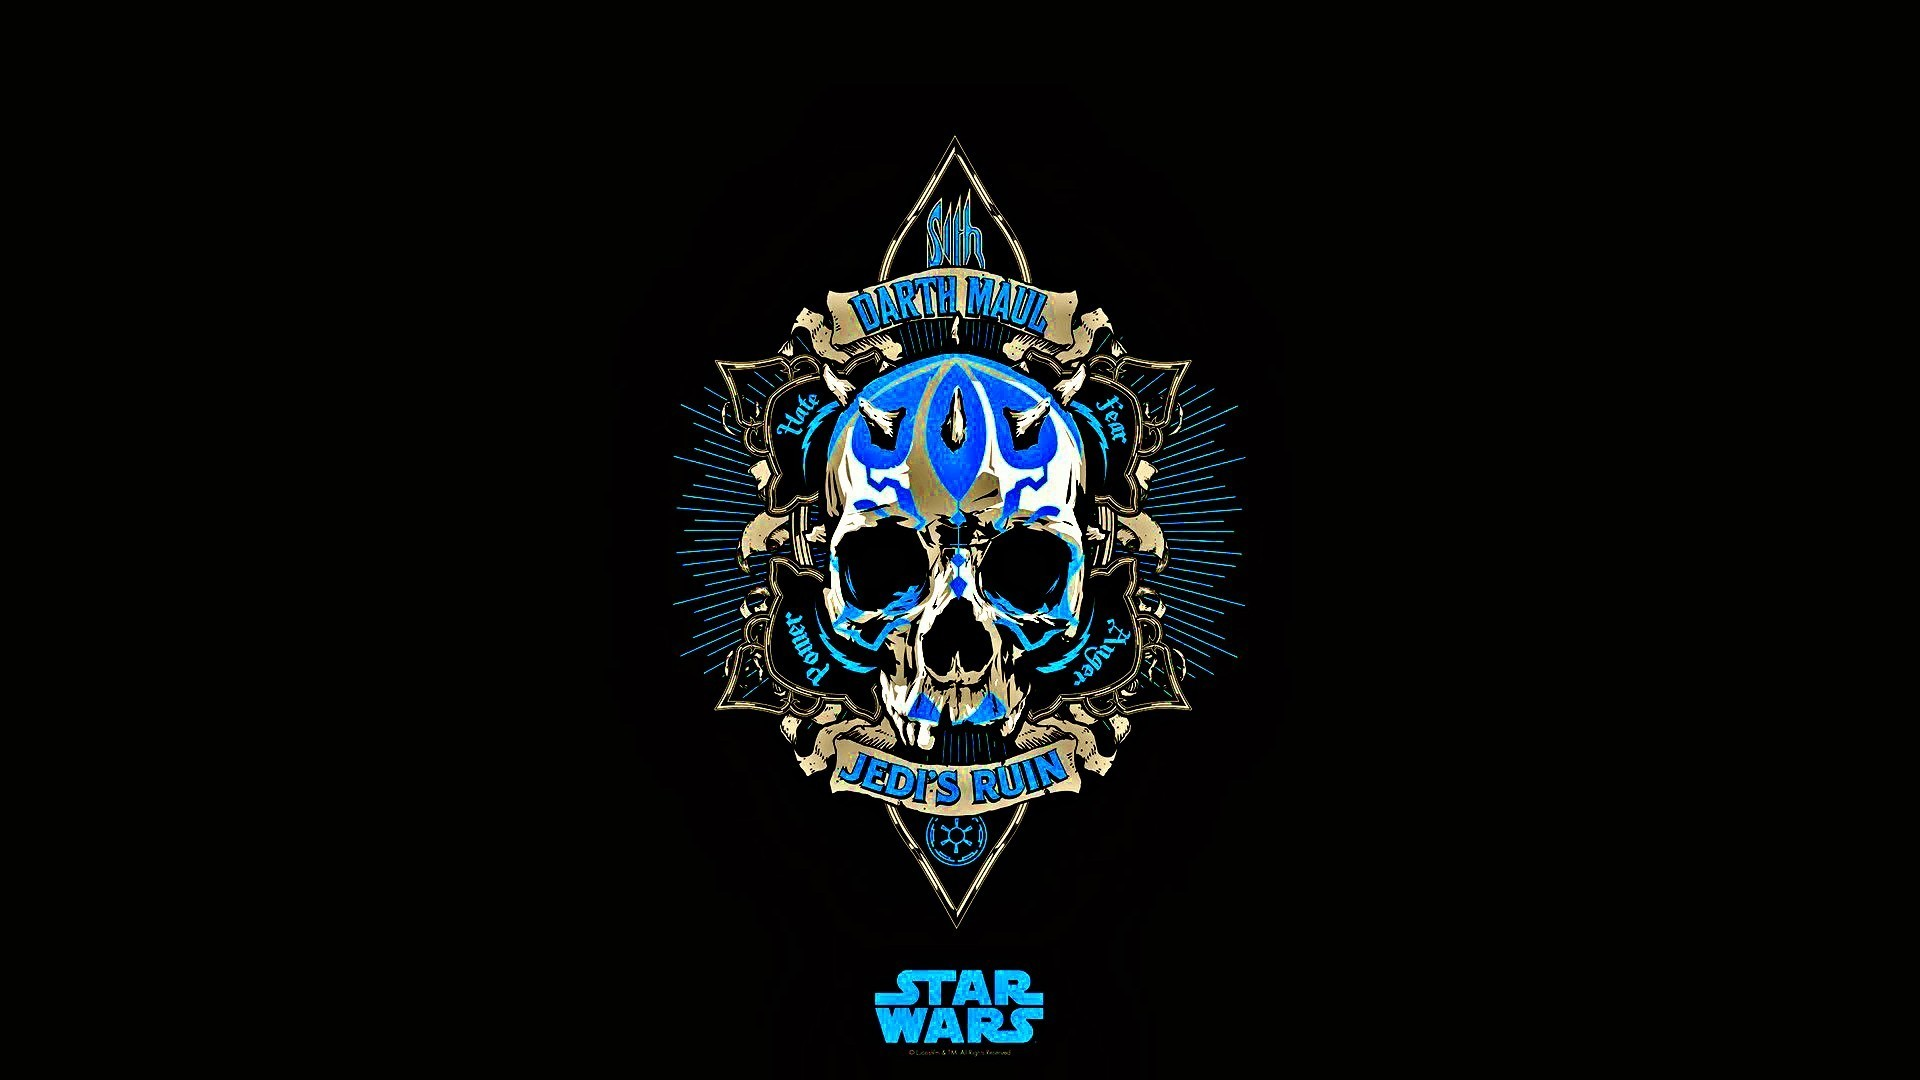 Star Wars, Jedi, Skull, Blue, Black, Darth Maul, Minimalism Wallpapers HD /  Desktop and Mobile Backgrounds